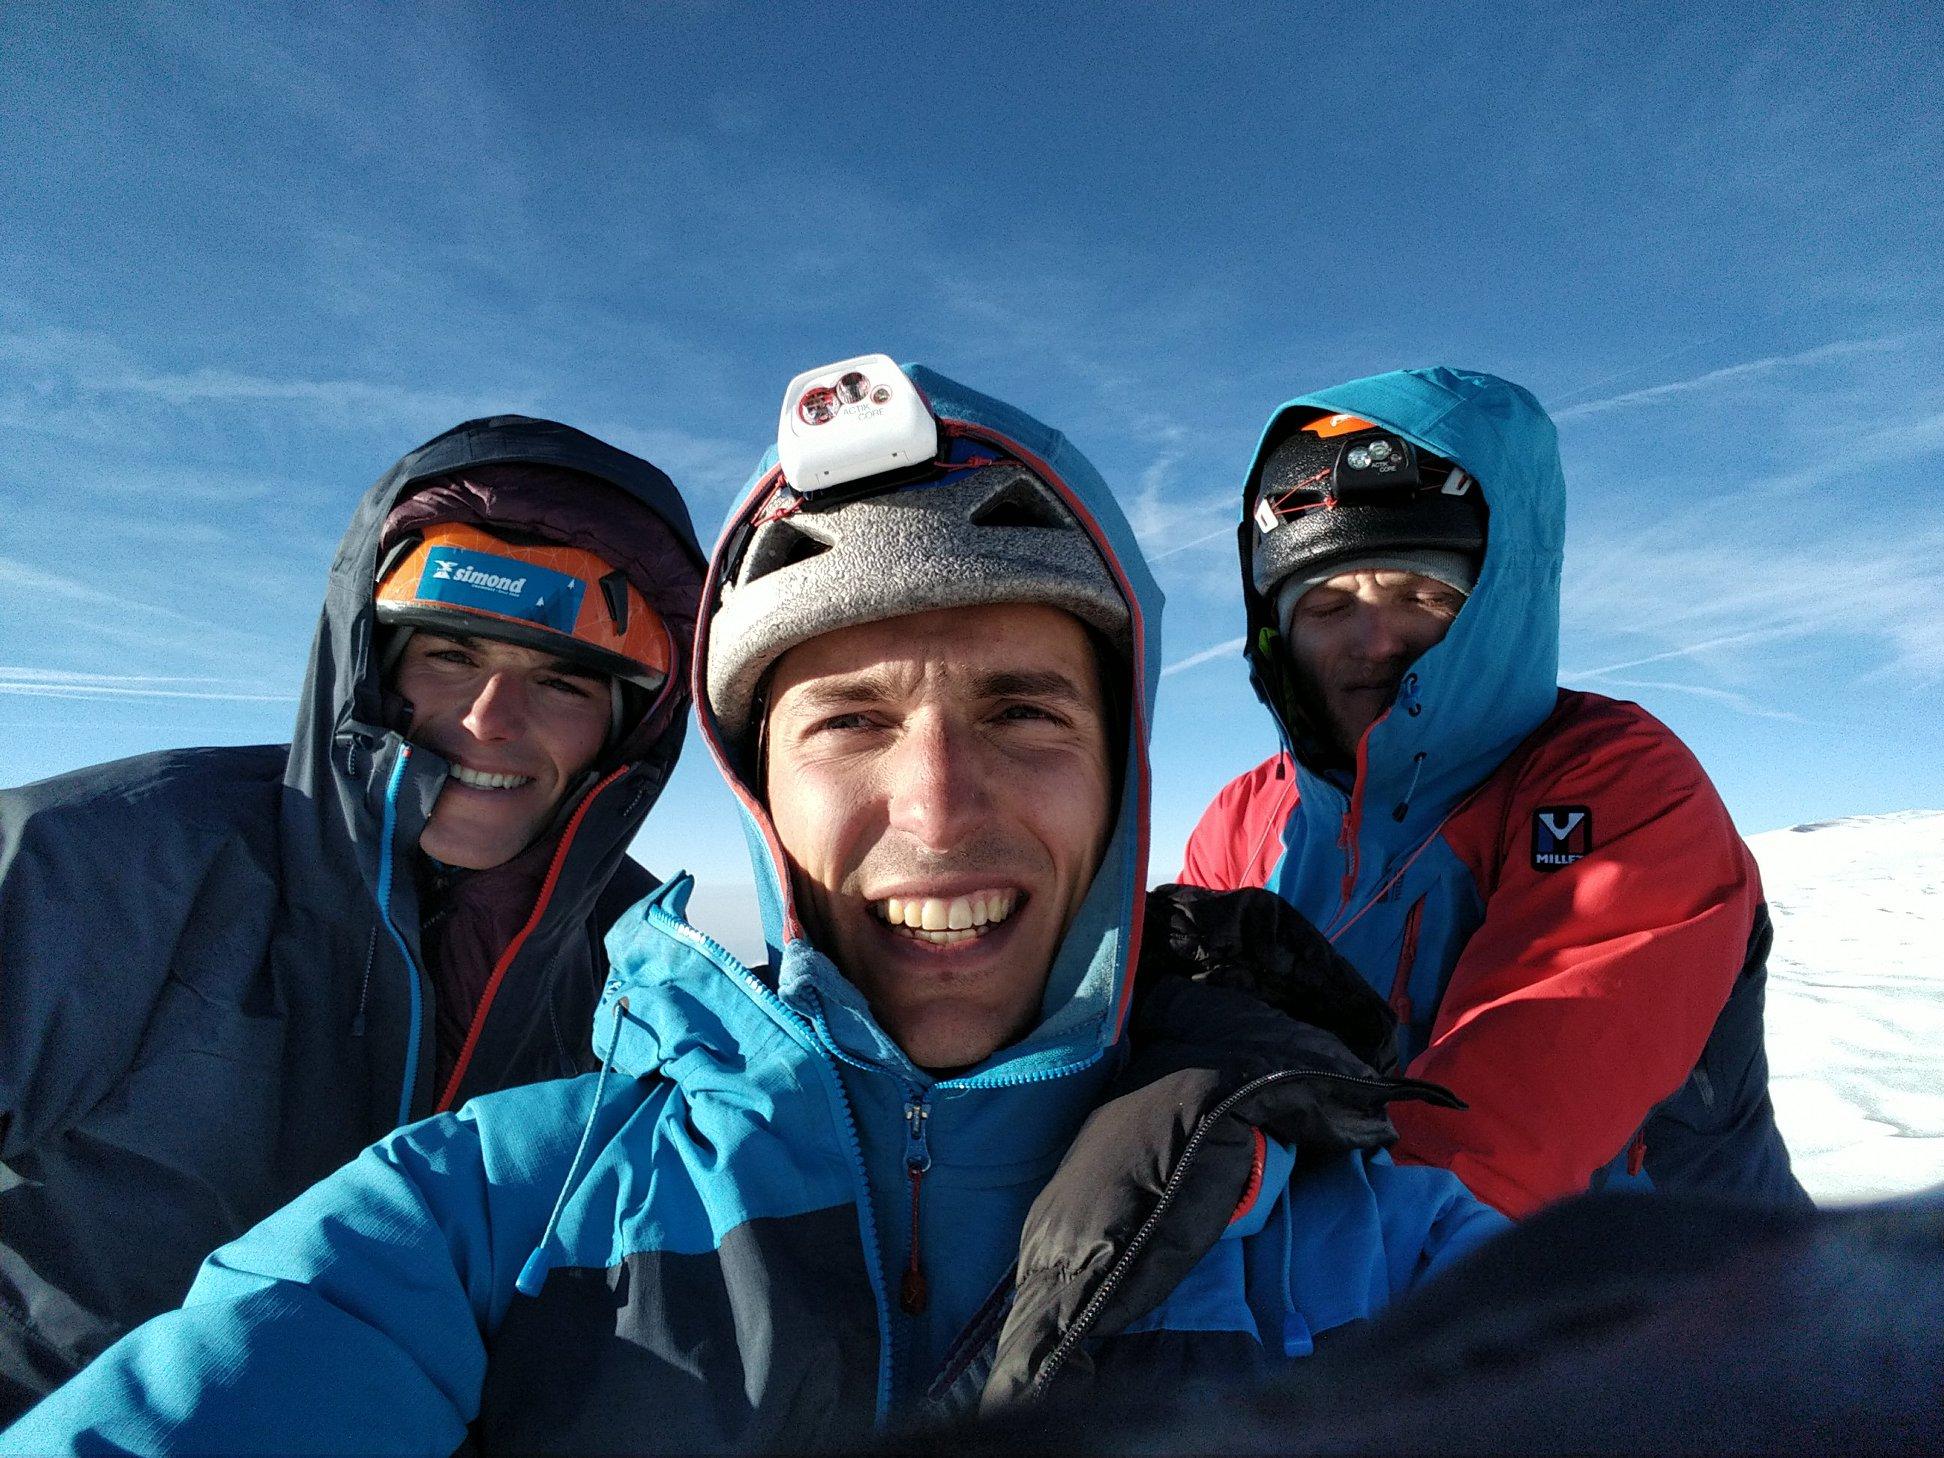 alpinismo, monte bianco, cassin, sperone walken, grandes jorasses